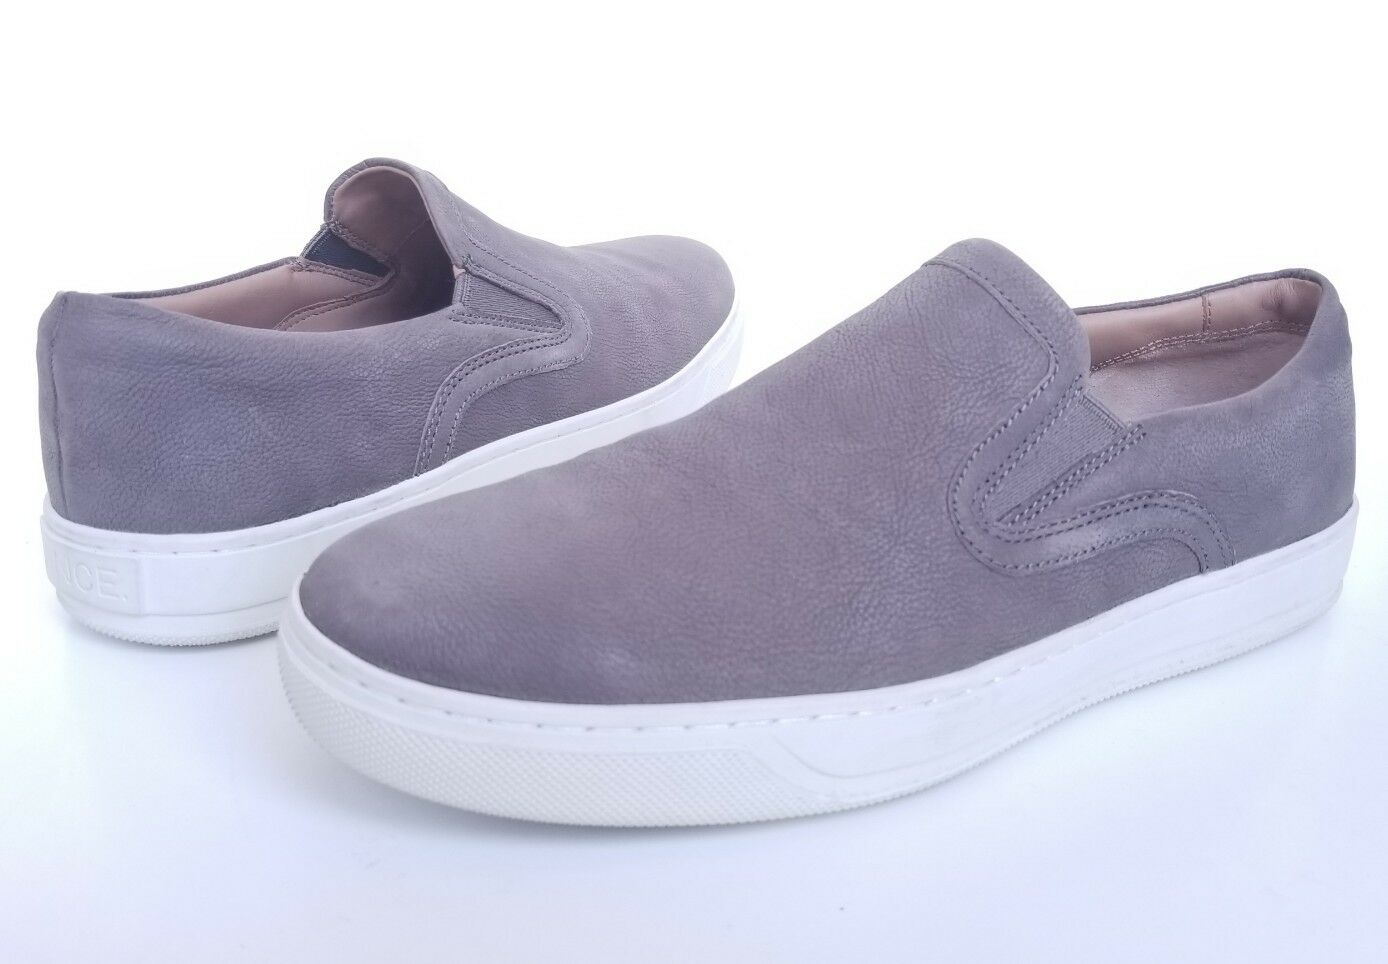 Vince 'Anderson' Slip-On Sneaker Gray Granite Size 8 M /